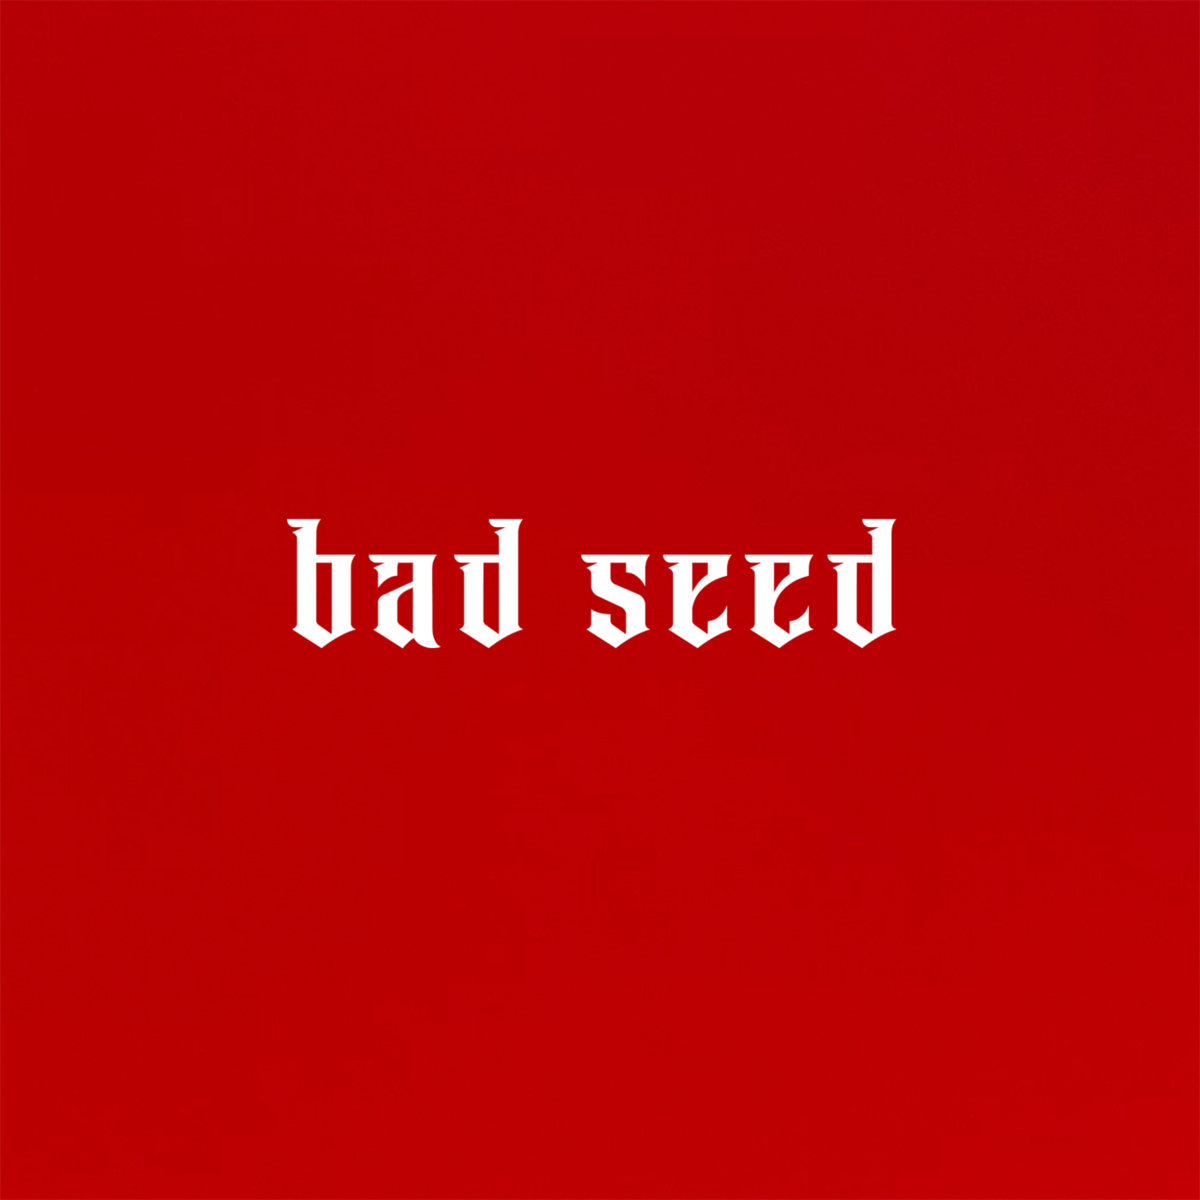 badseed